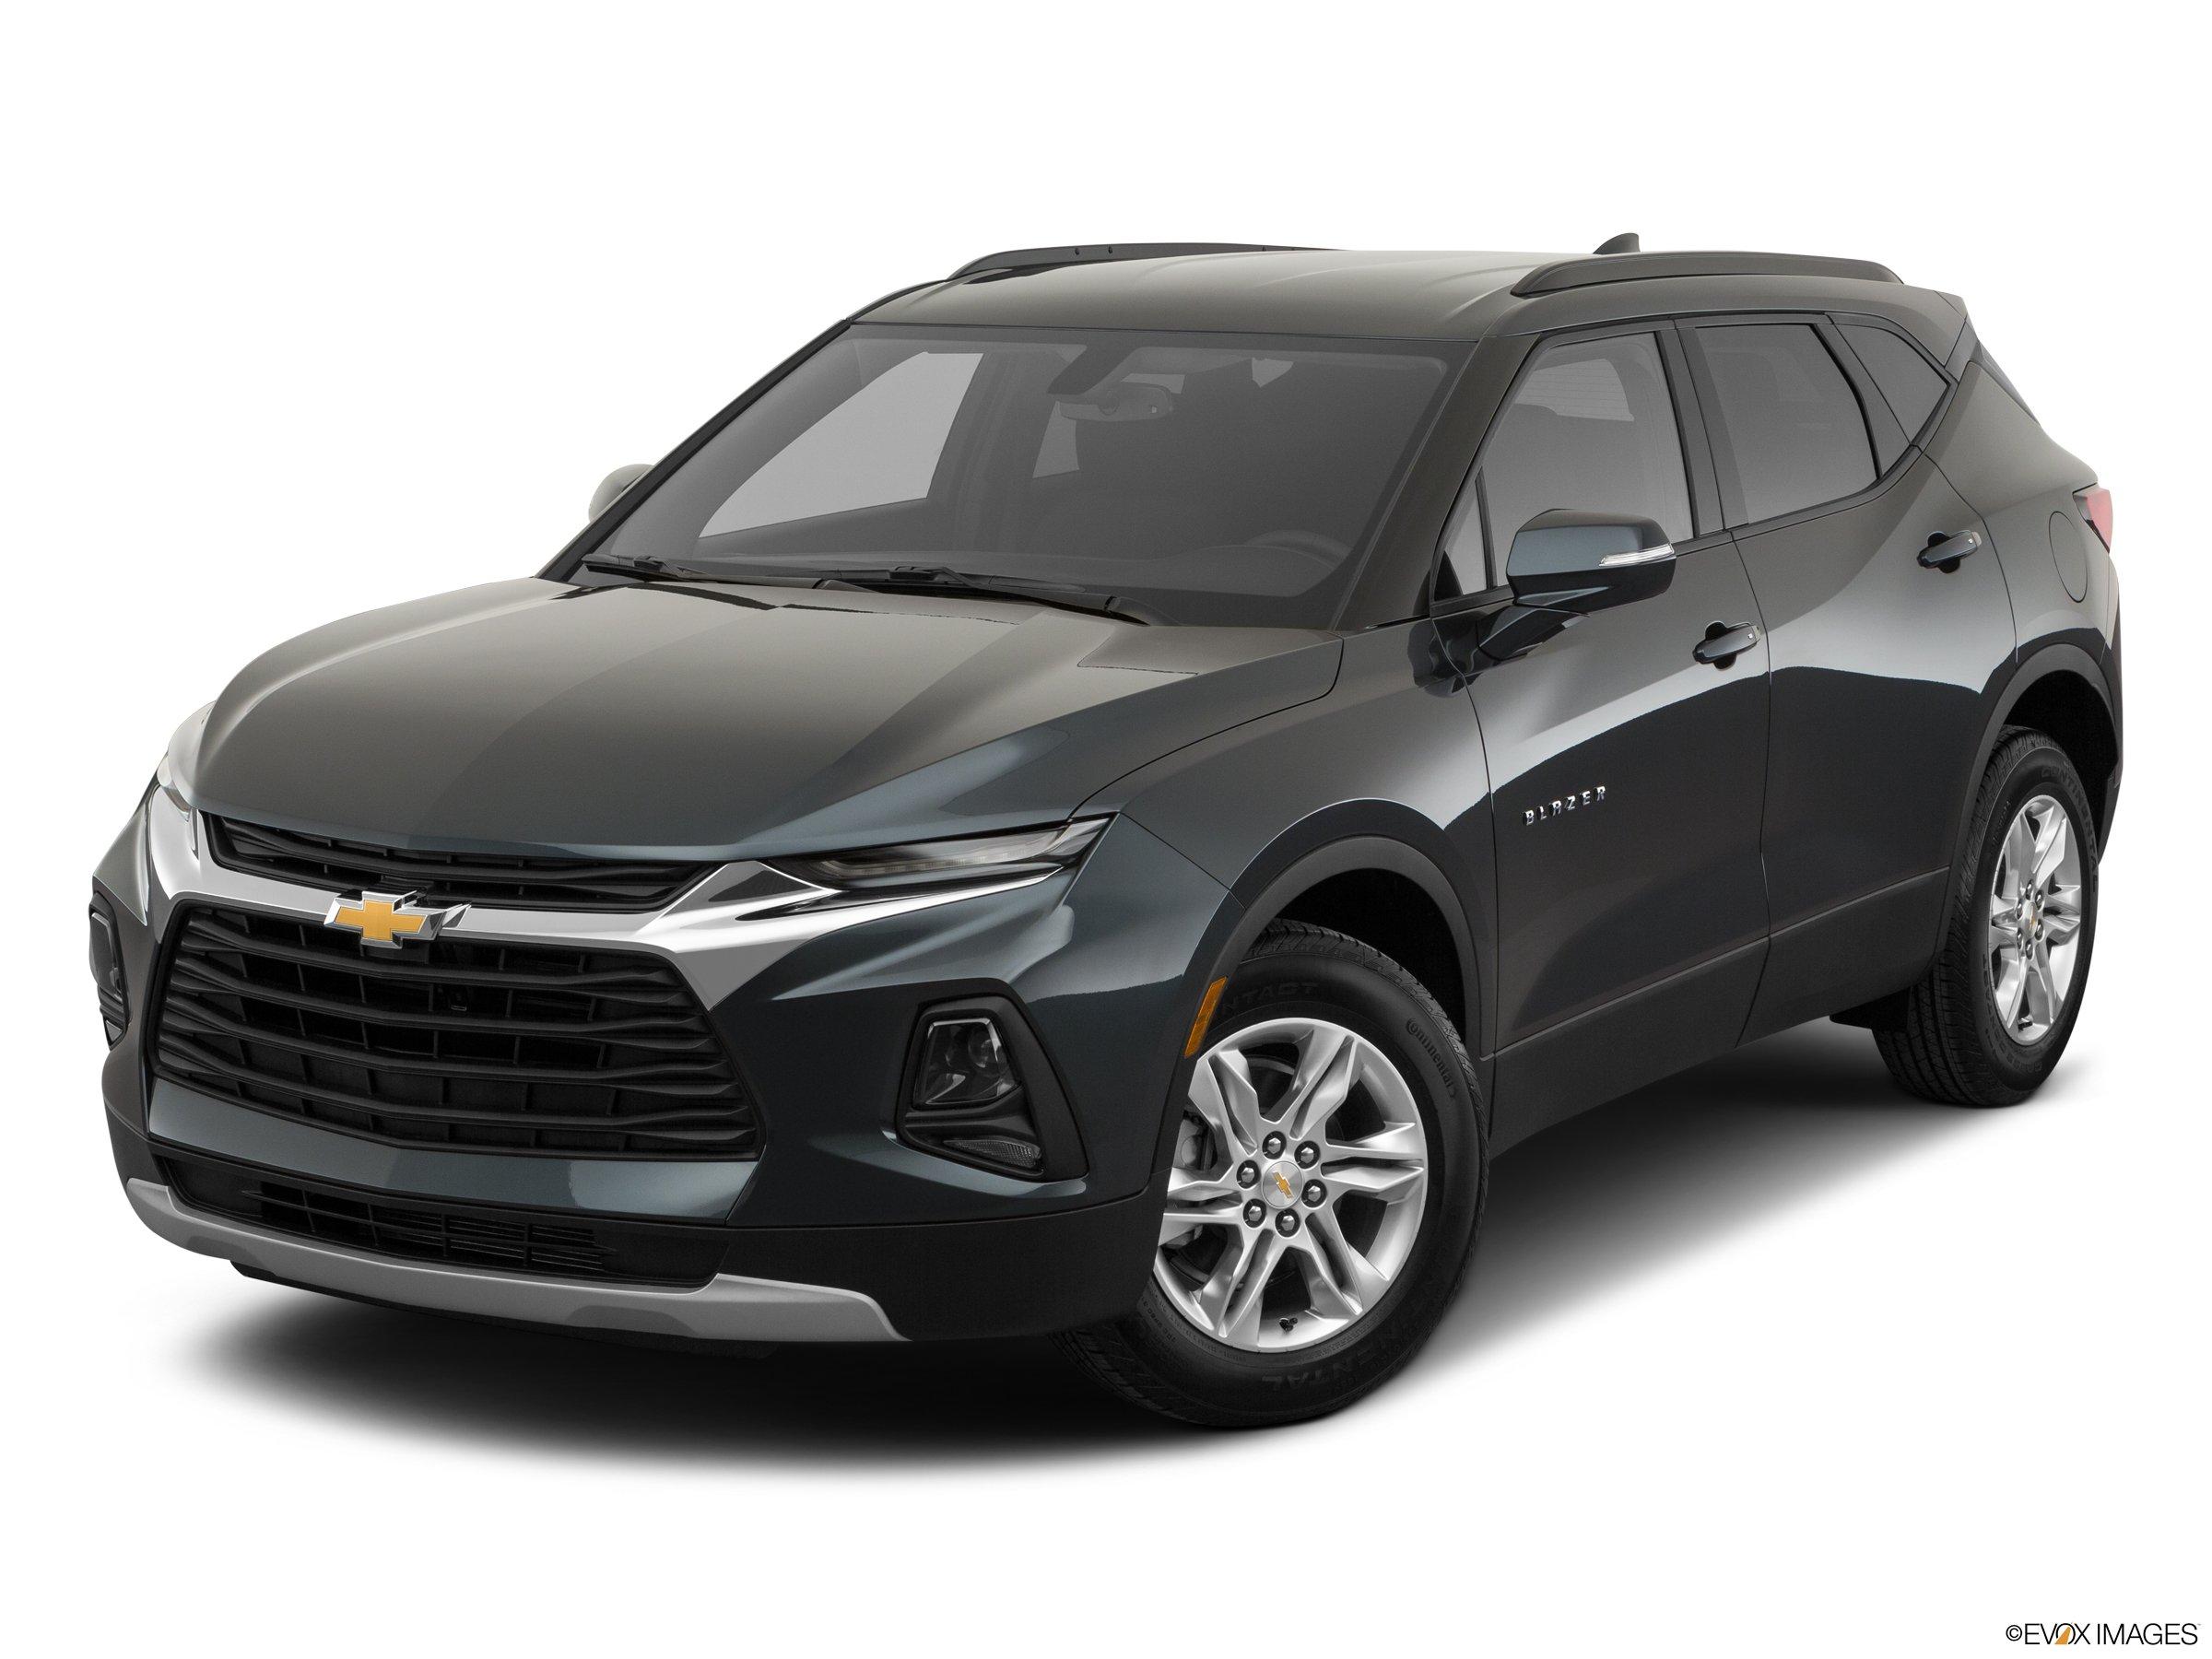 2020 Chevrolet Blazer 2LT FWD CUV